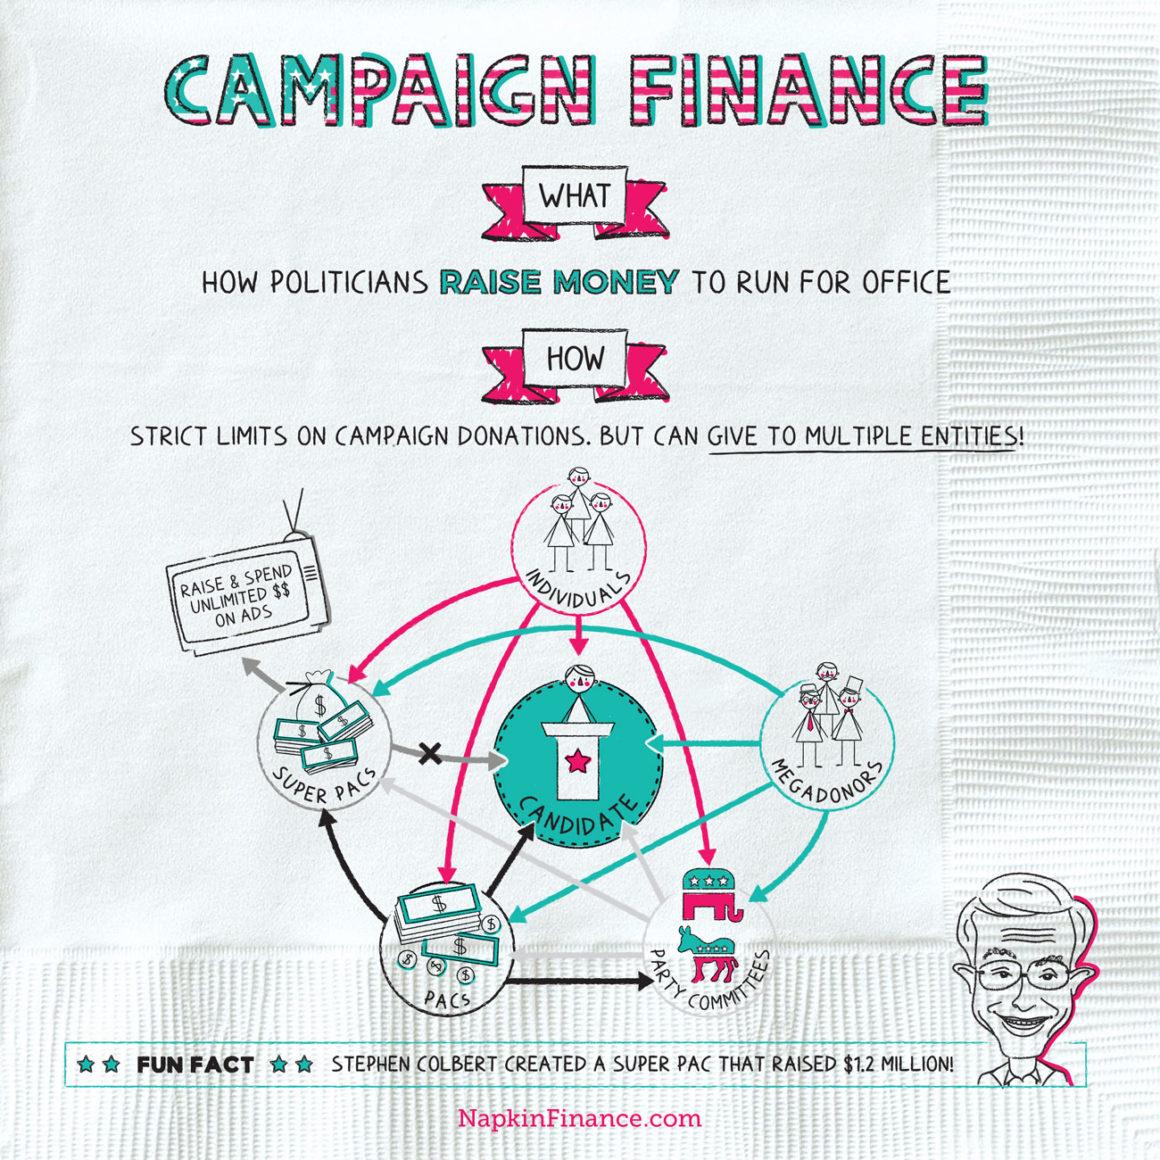 NapkinFinance-CampaignFinance-Napkin-04-24-19-v06